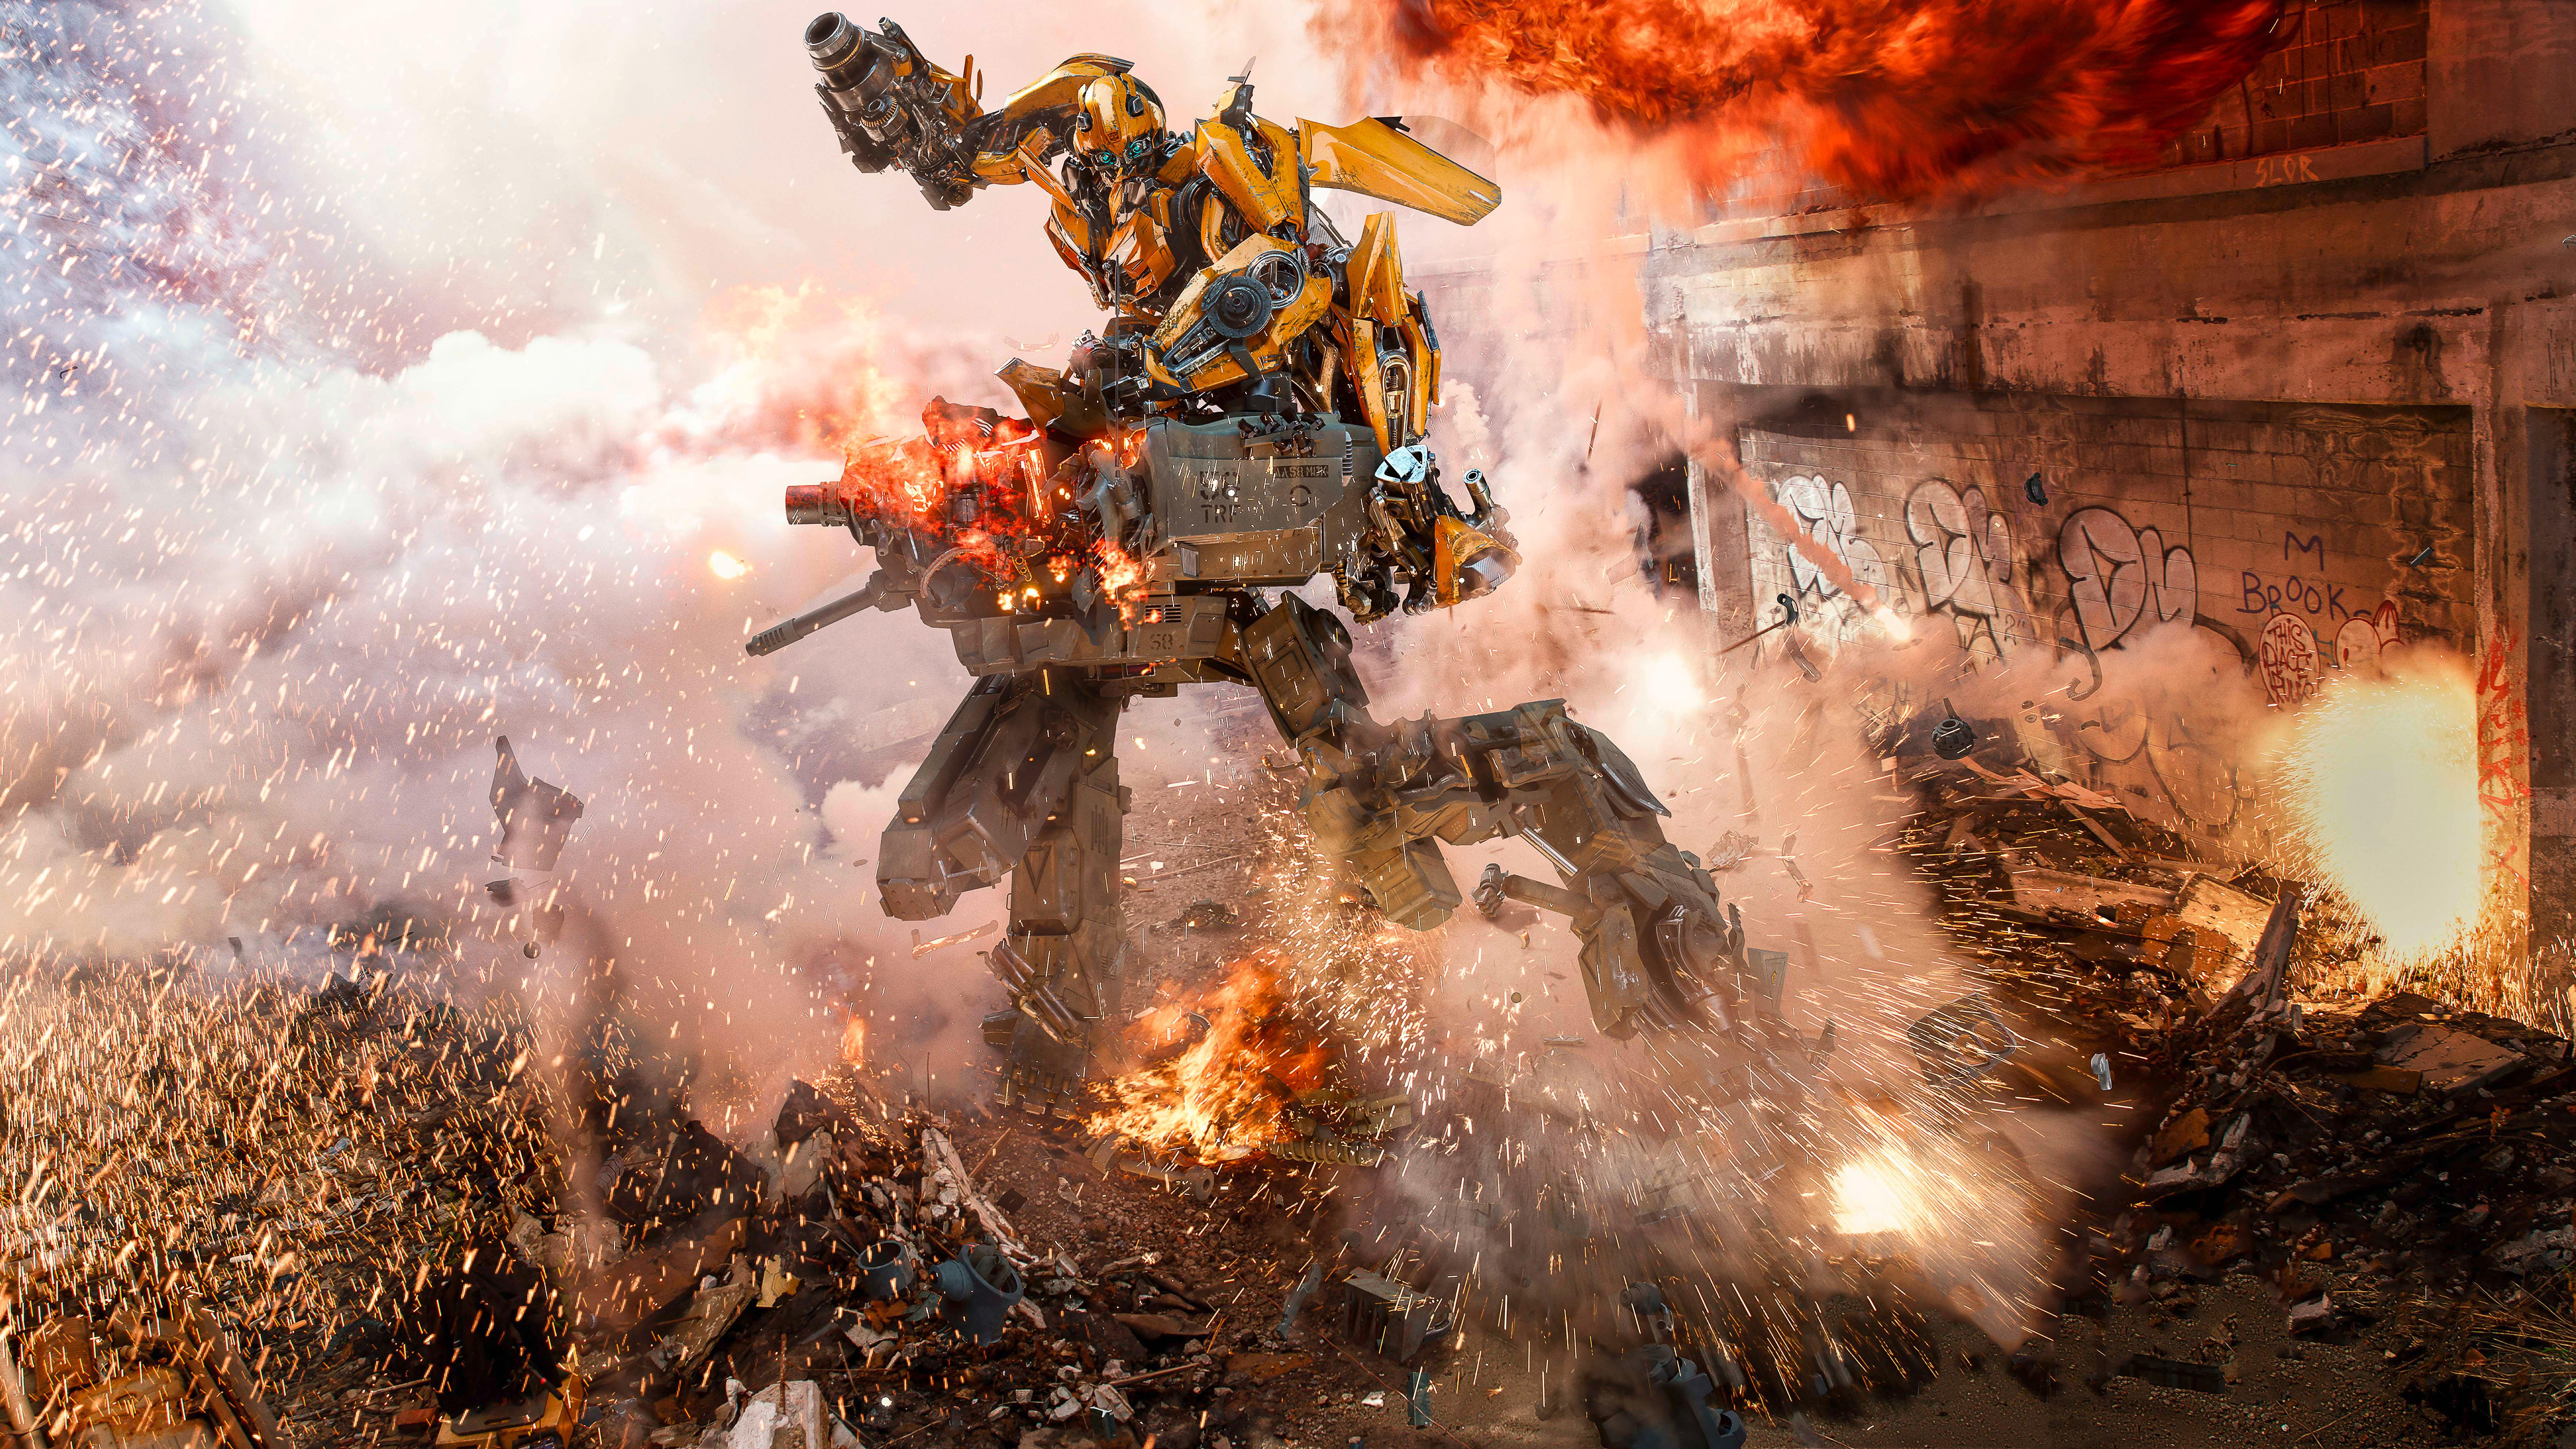 transformers the last knight full movie download full hd 1080p (2017)